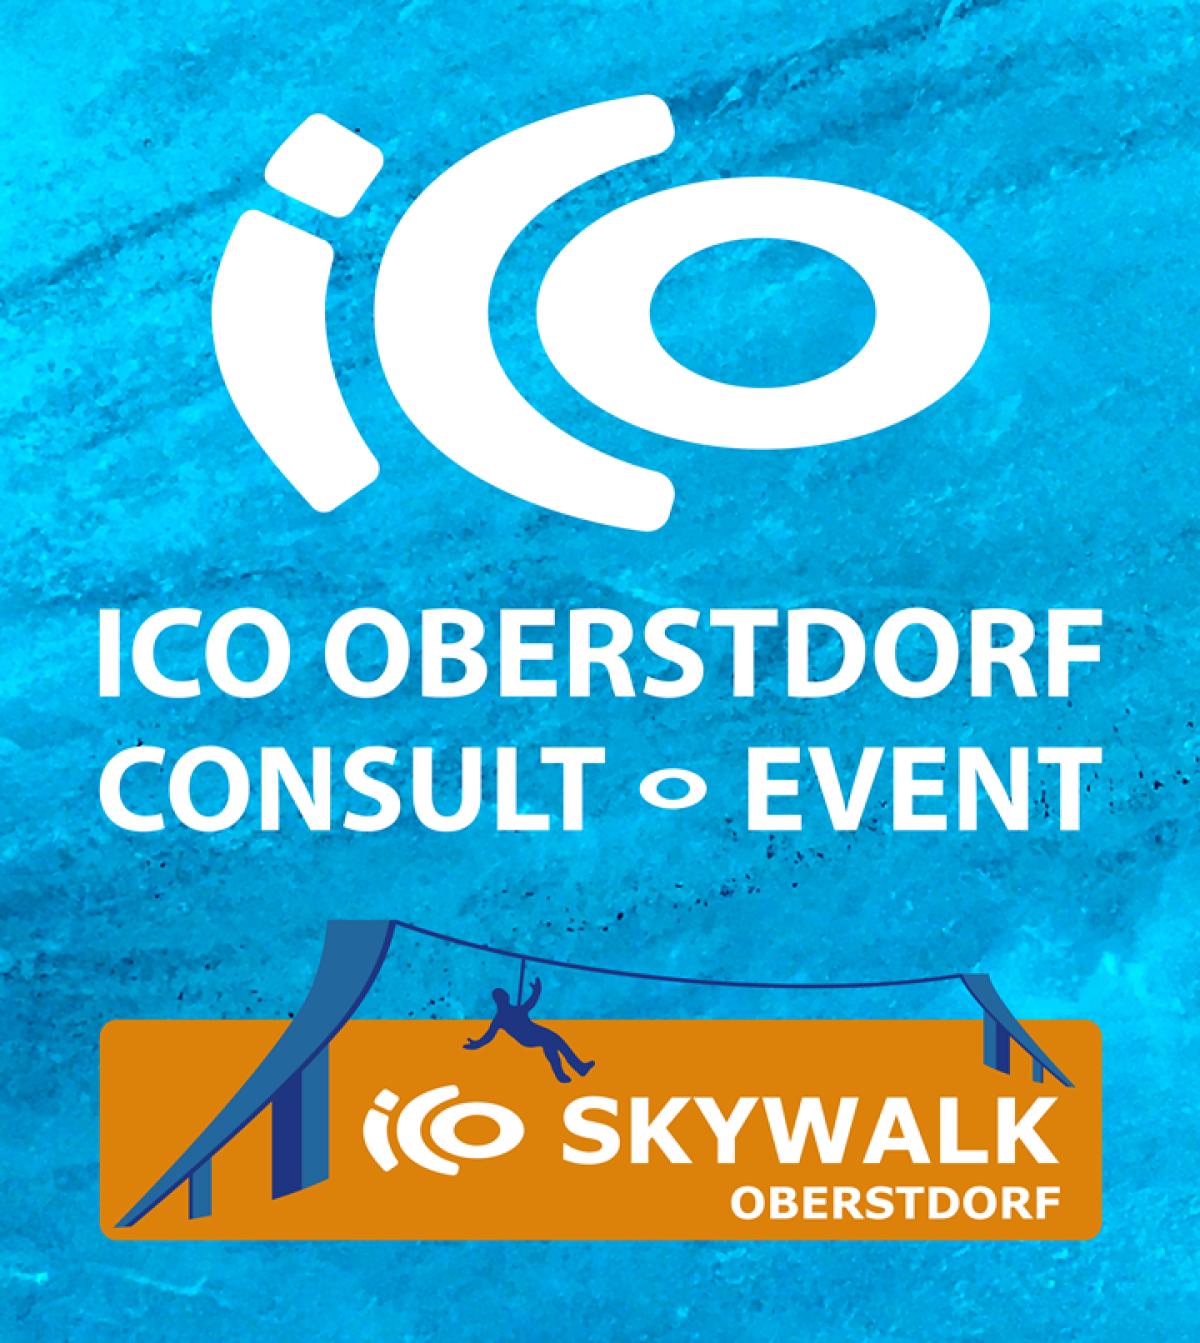 ICO Oberstdorf - Skywalk